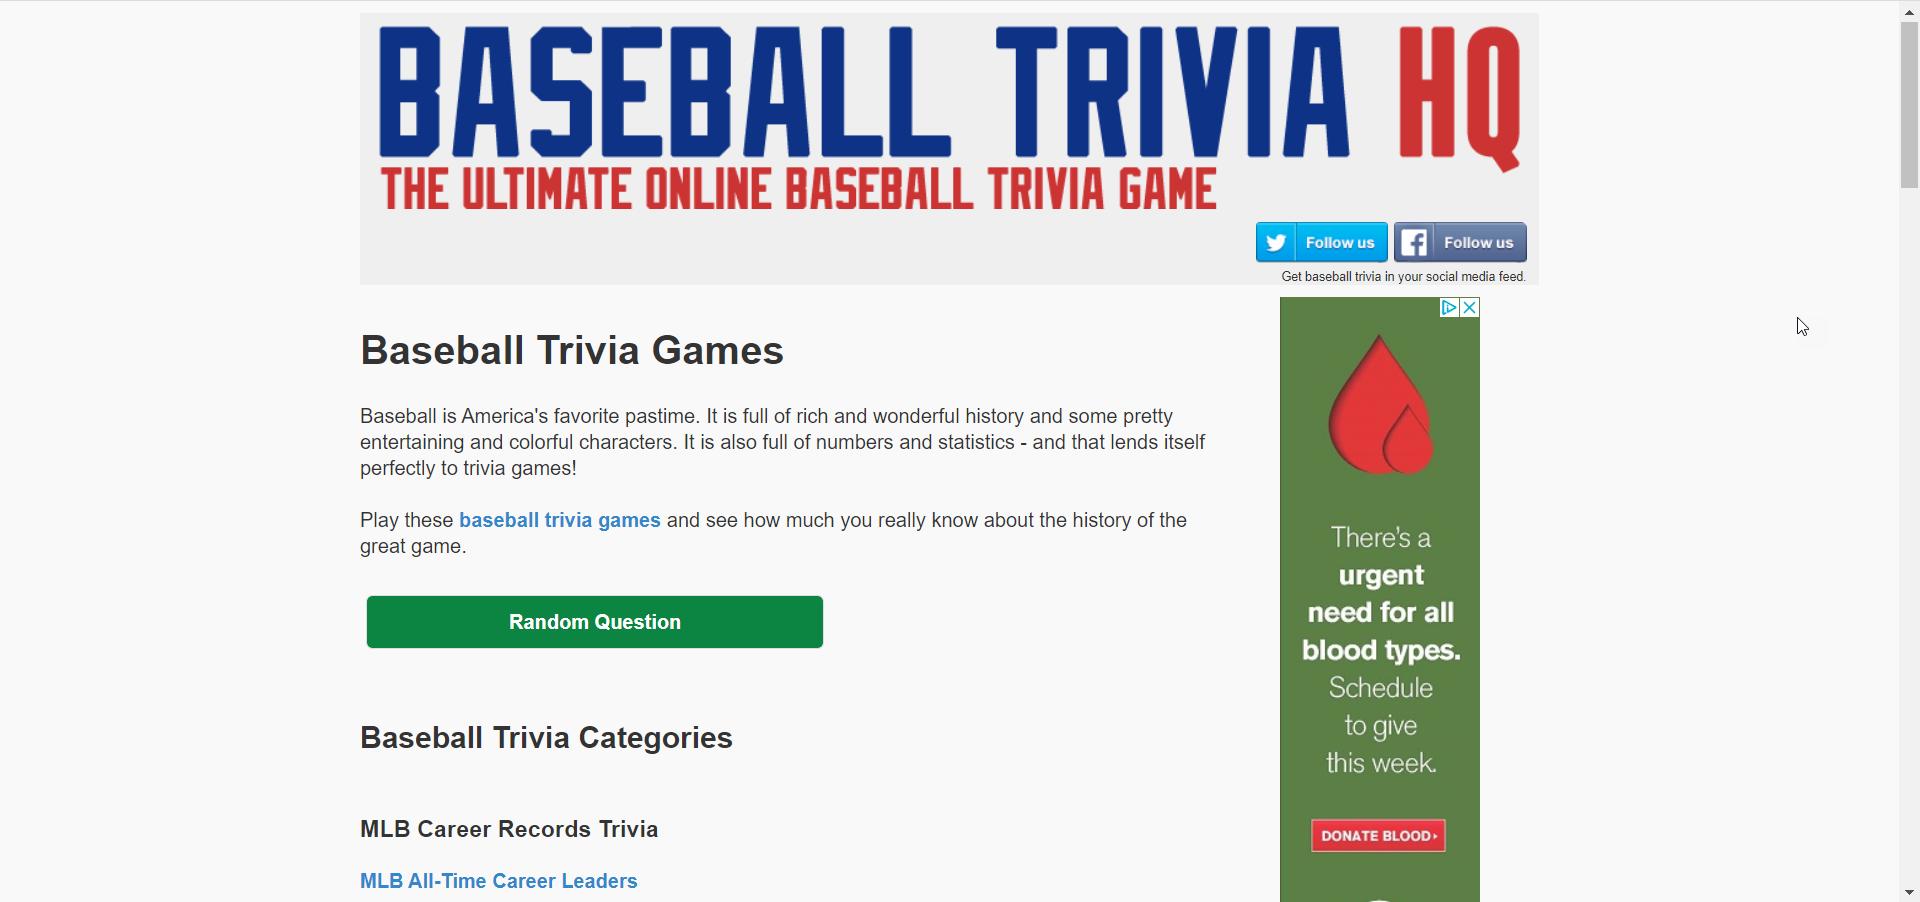 Baseball Trivia IQ